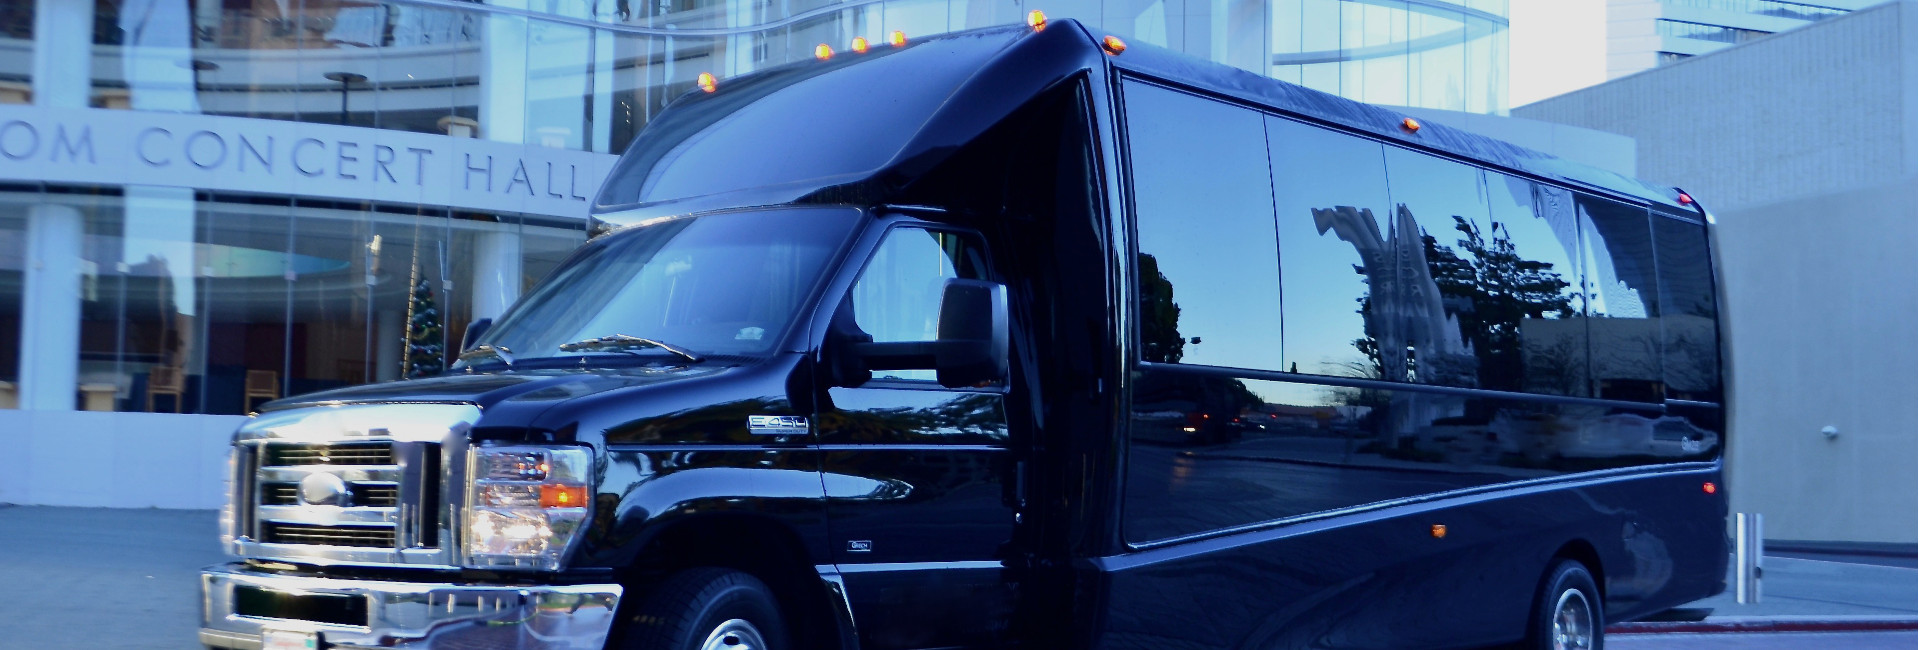 toronto-mini-bus-rentals